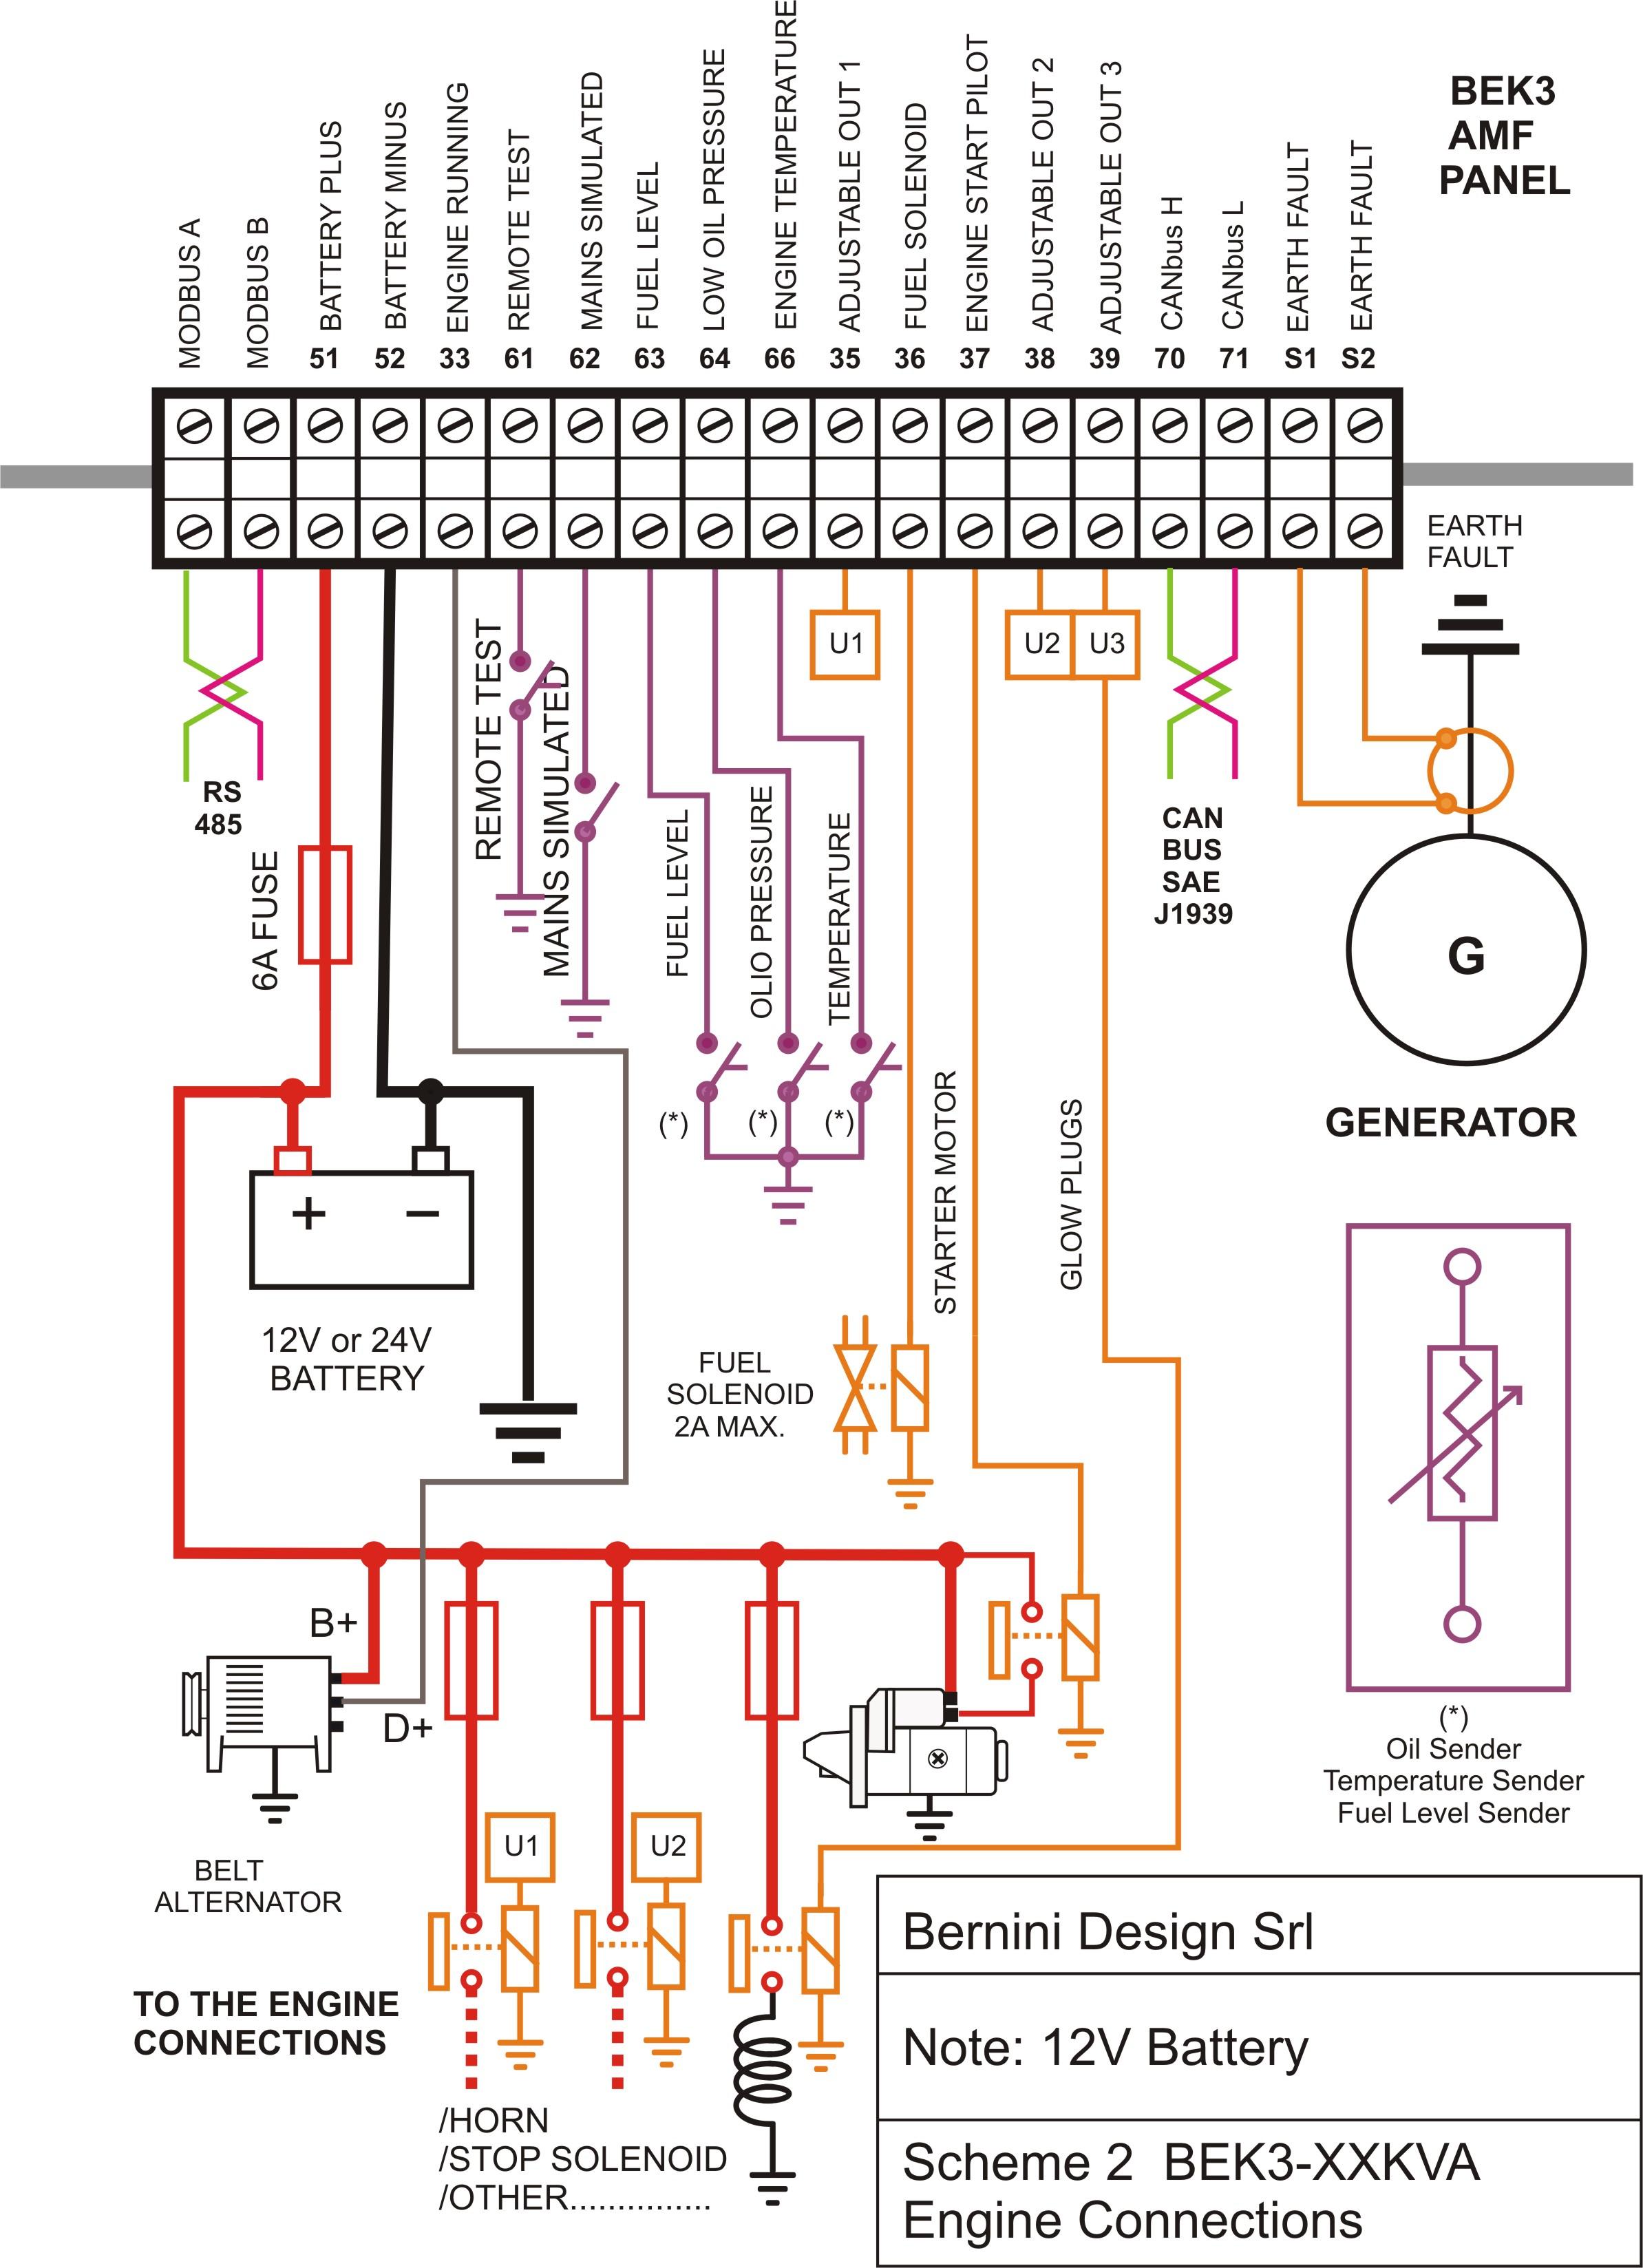 plc control panel wiring diagram pdf Collection-2387x3295 Car Diagram Electrical Drawing Basics Pdf Zen Diagram Electric 3-a